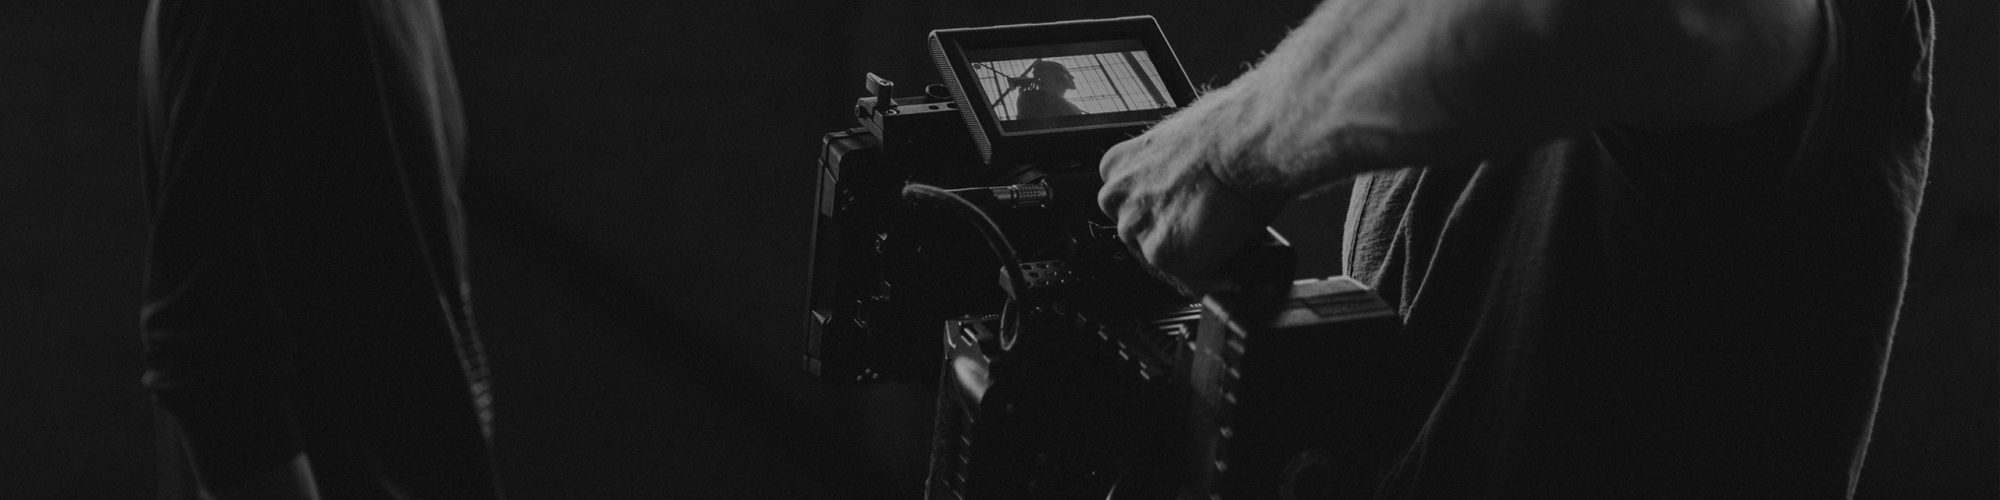 camera-tournage-fond-entete